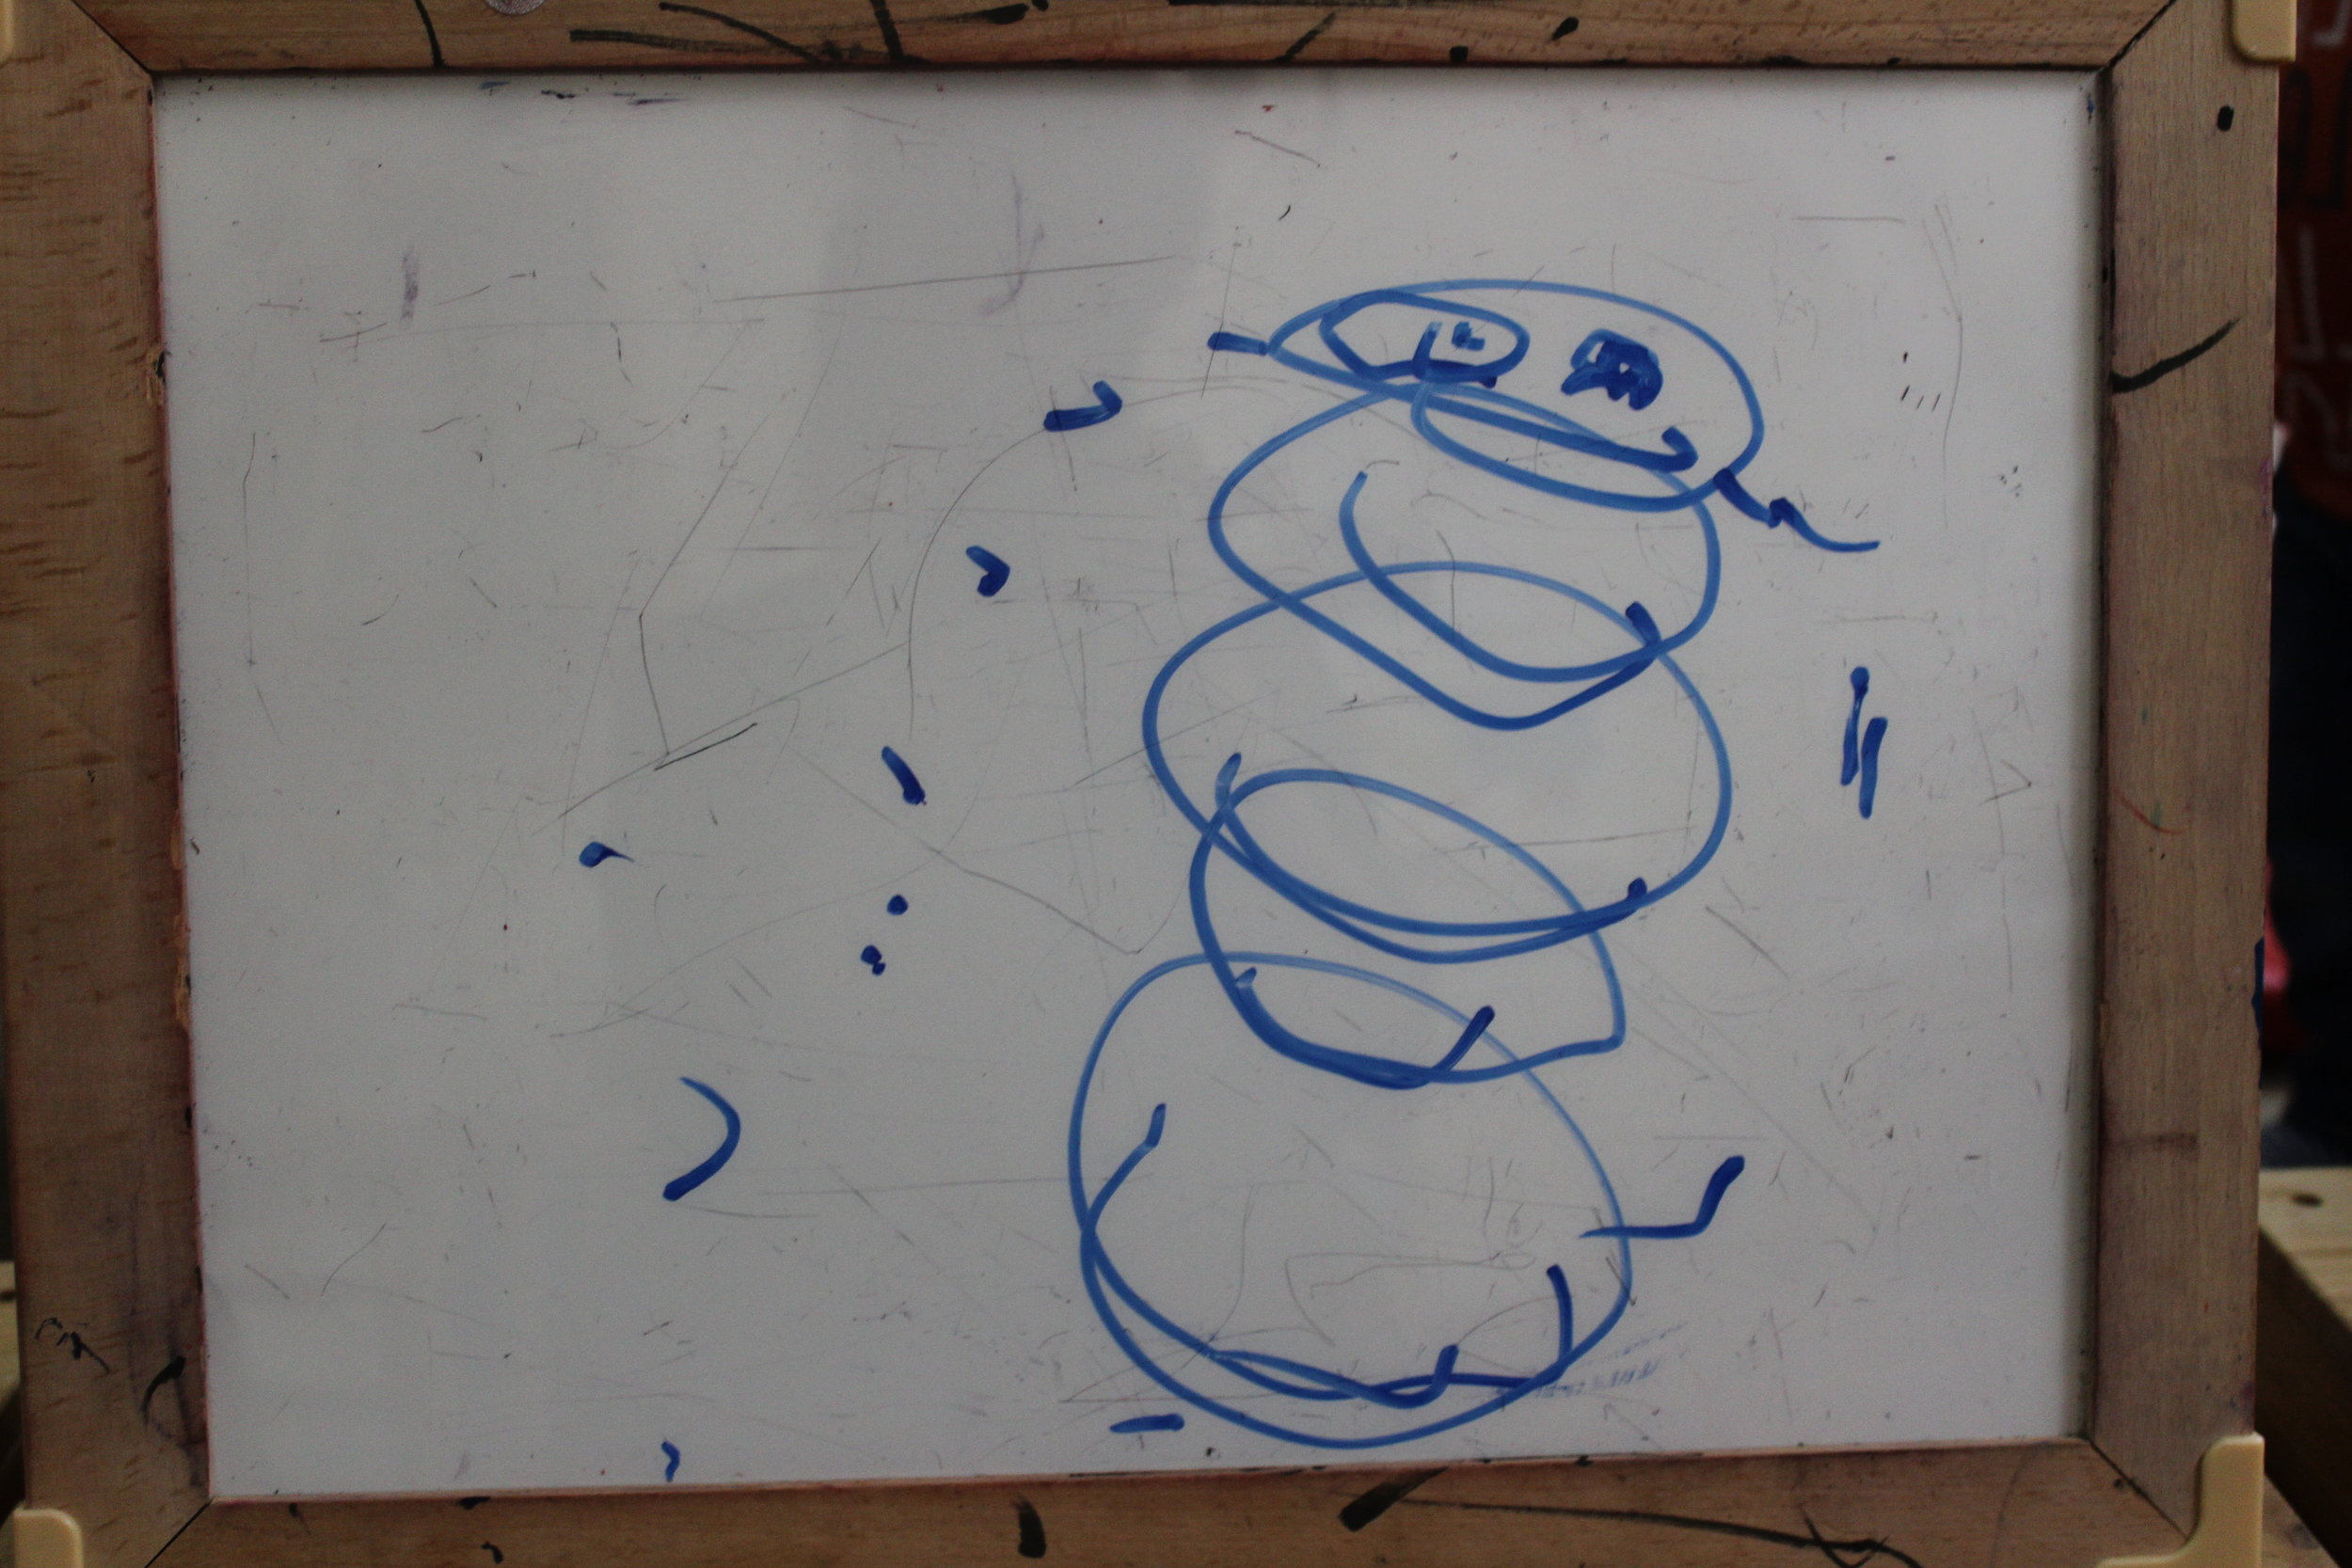 Harry drew a snowman on the erasable board!